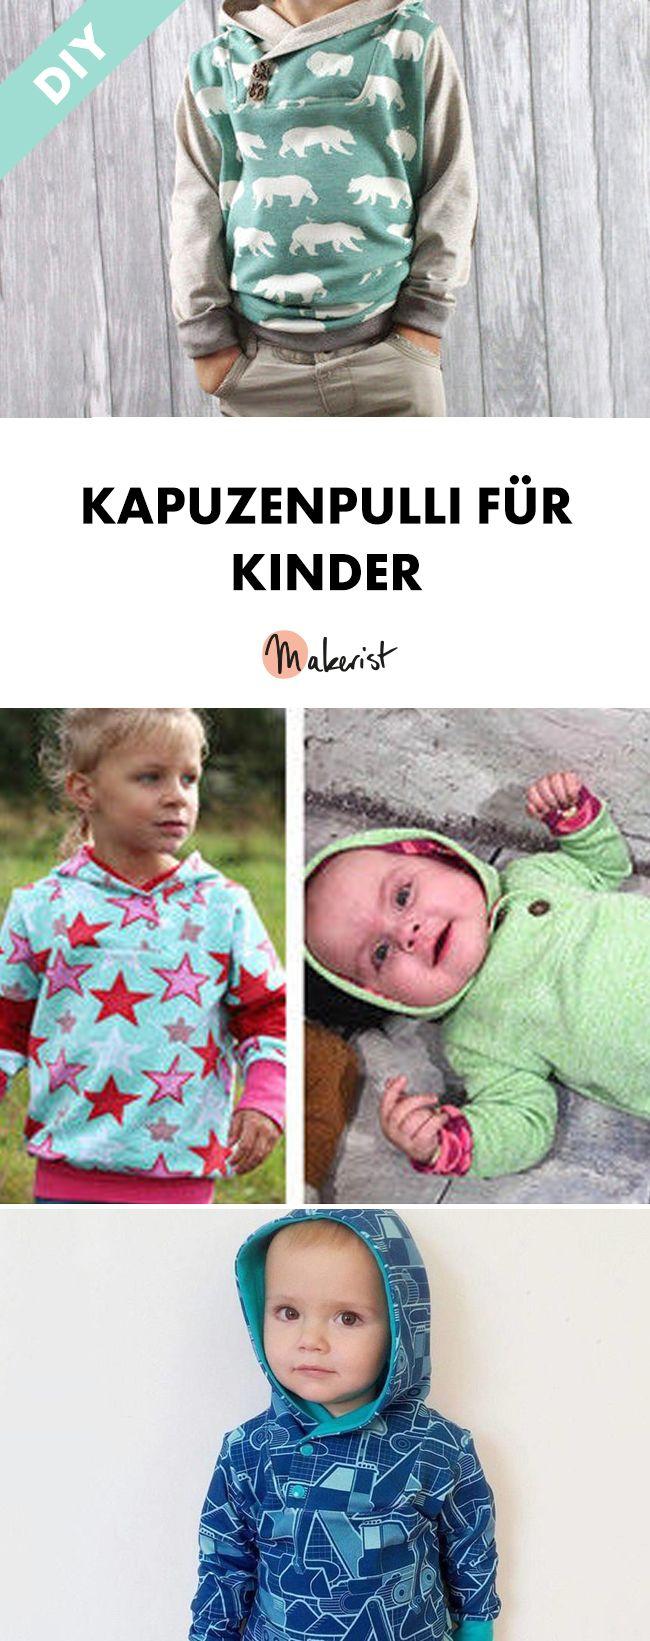 Lässiger Kinderhoodie mit verschiedenen Varianten - Nähanleitung und Schnittmuster via Makerist.de